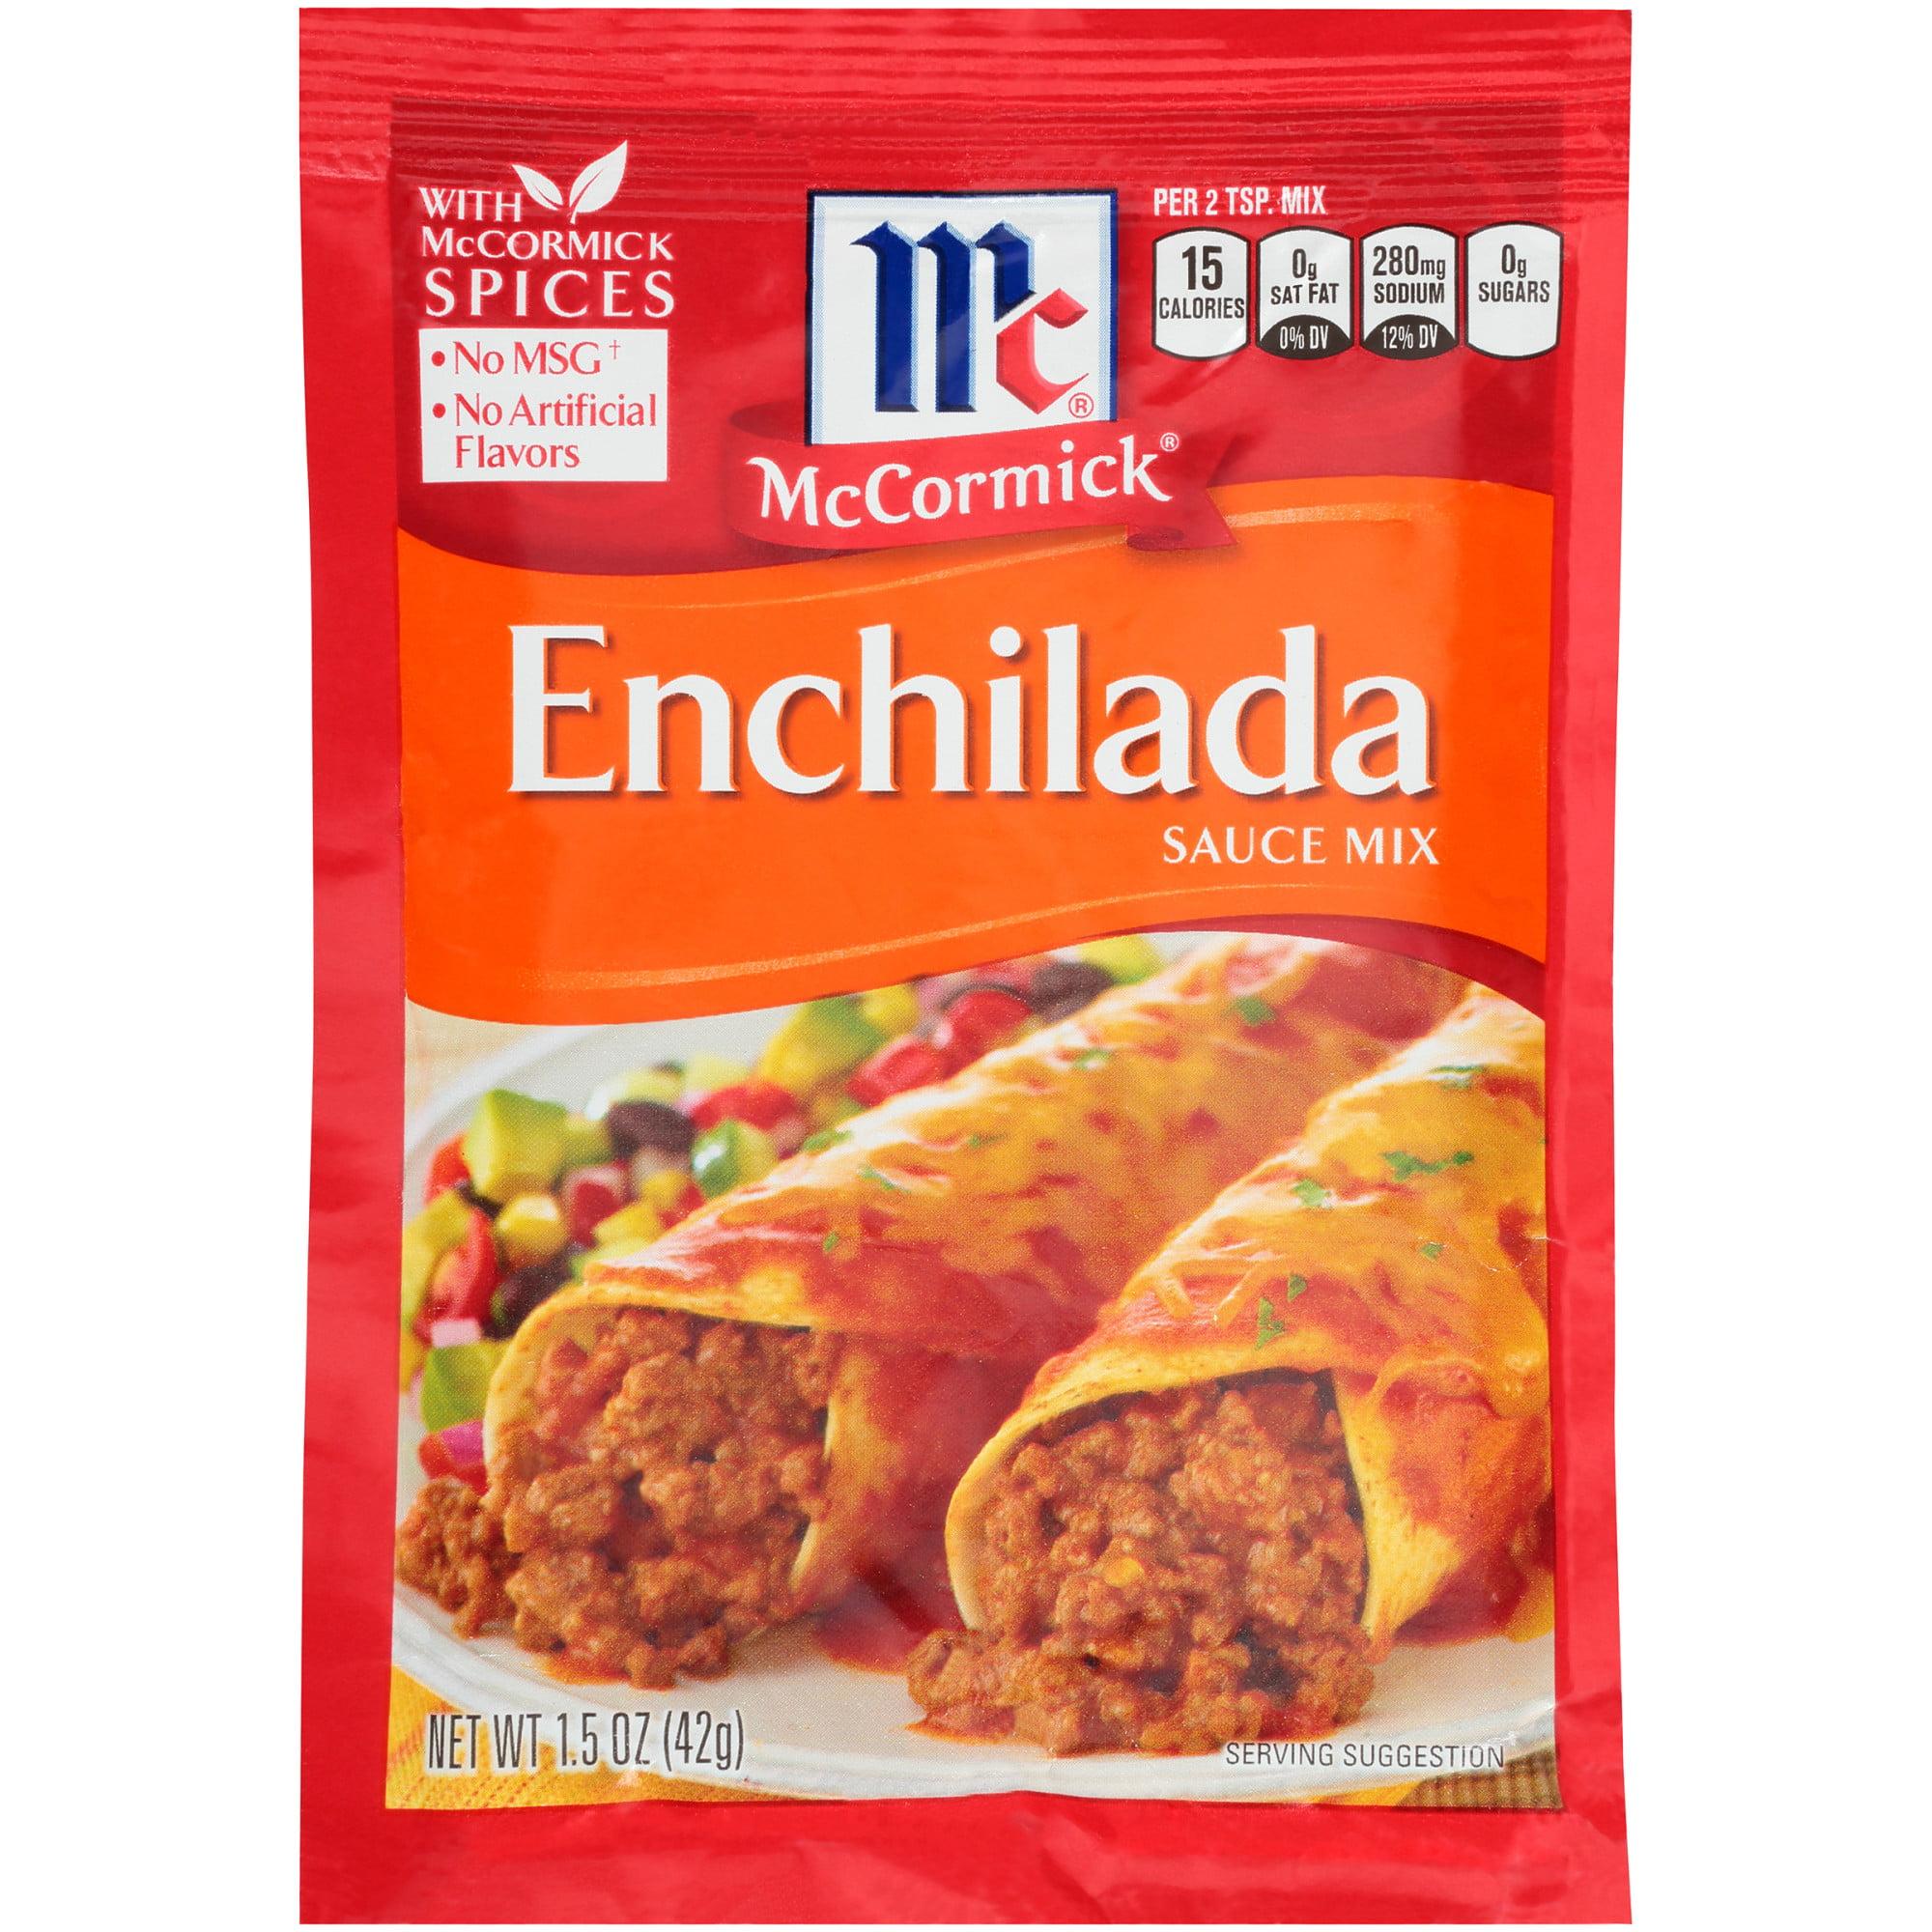 (4 Pack) McCormick Enchilada Sauce Mix, 1.5 oz